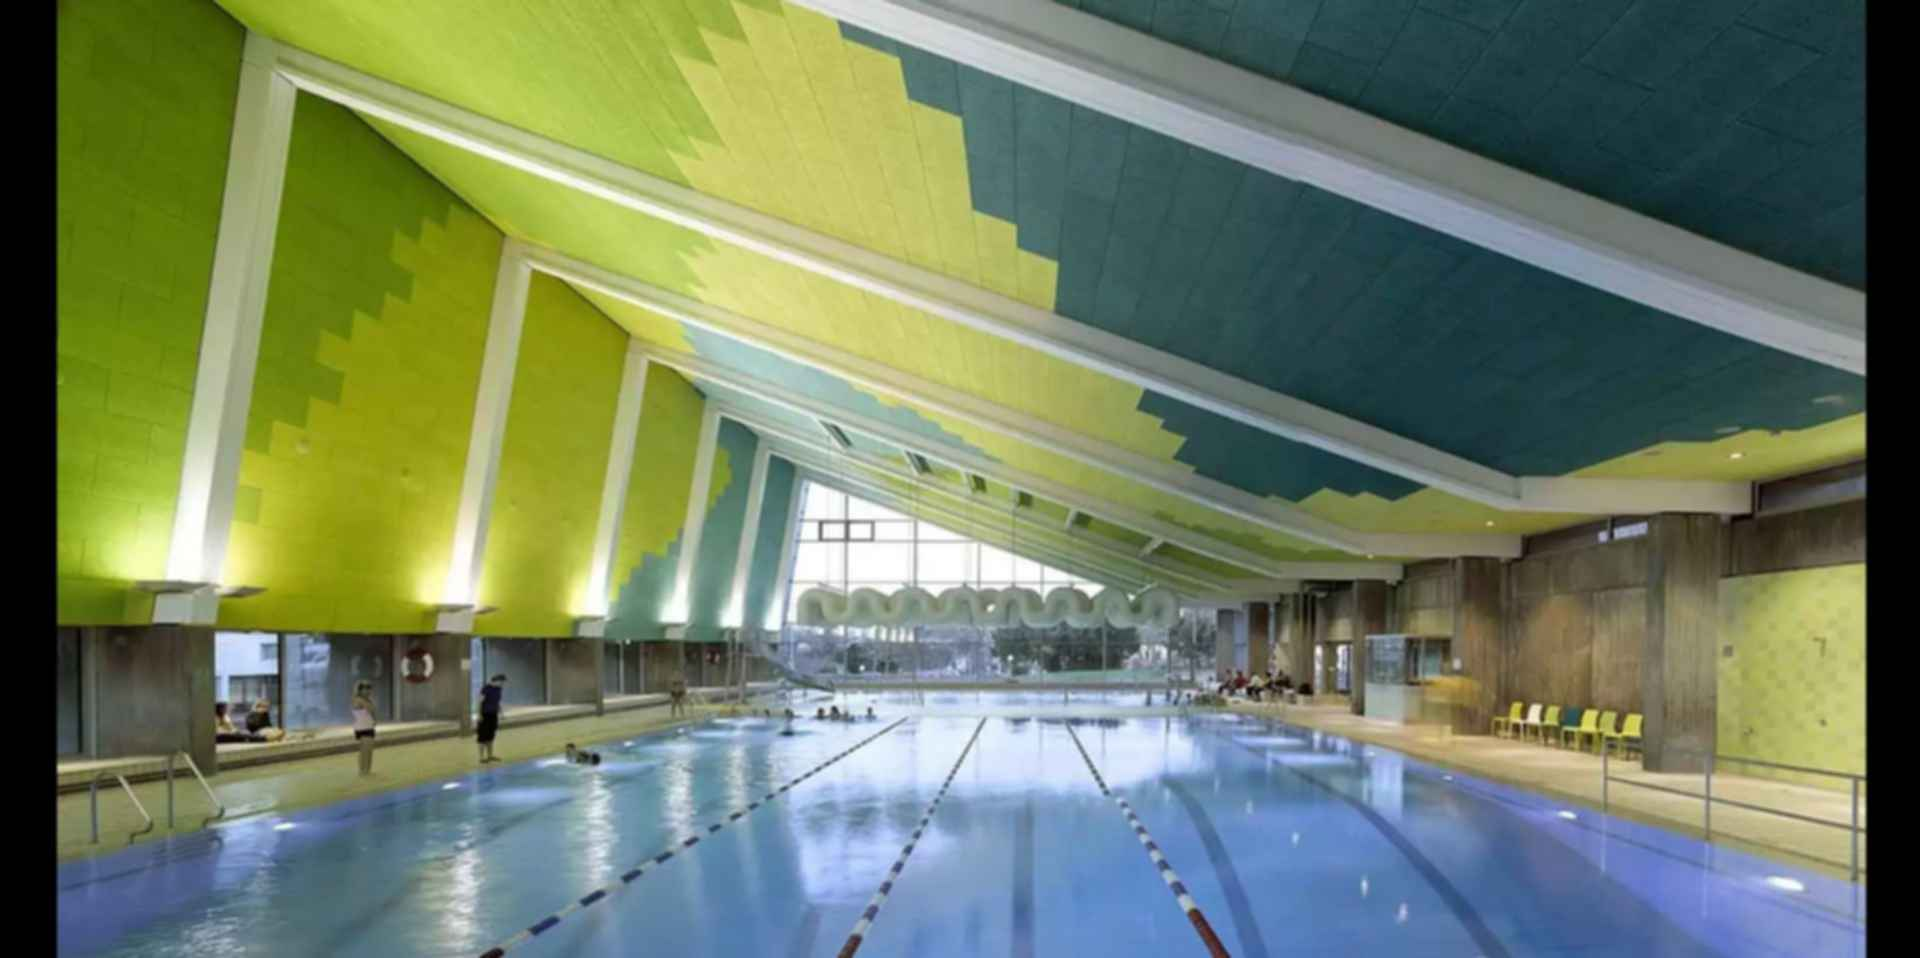 Sports Center in Leonberg - Interior/Swimming Pool